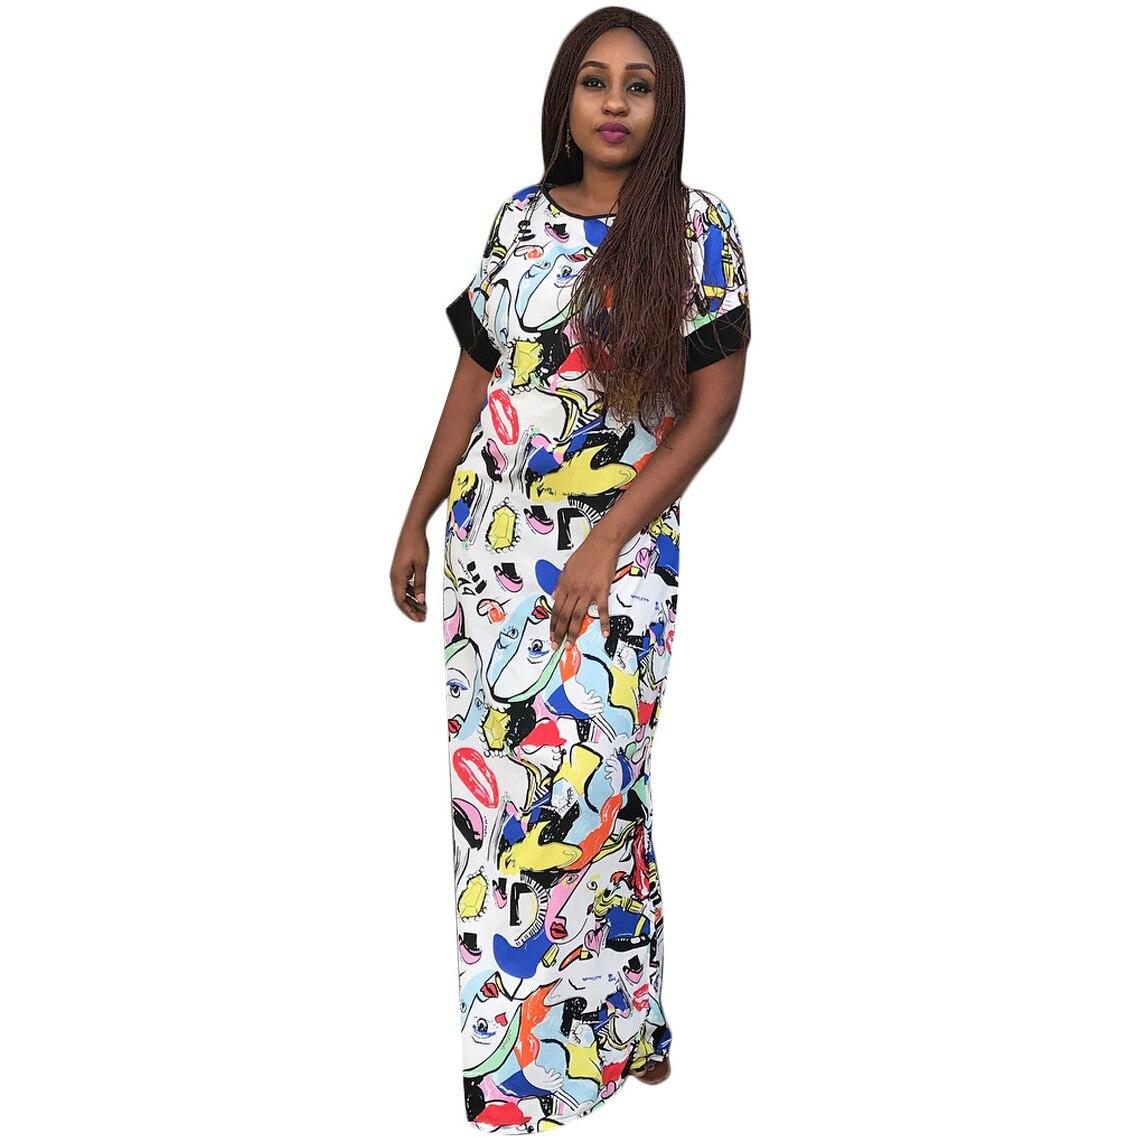 Women O Neck Sexy Character Print Dress Short Sleeve Bodycon Vintage Dress Summer Long Party Dress 2018 Vestidos